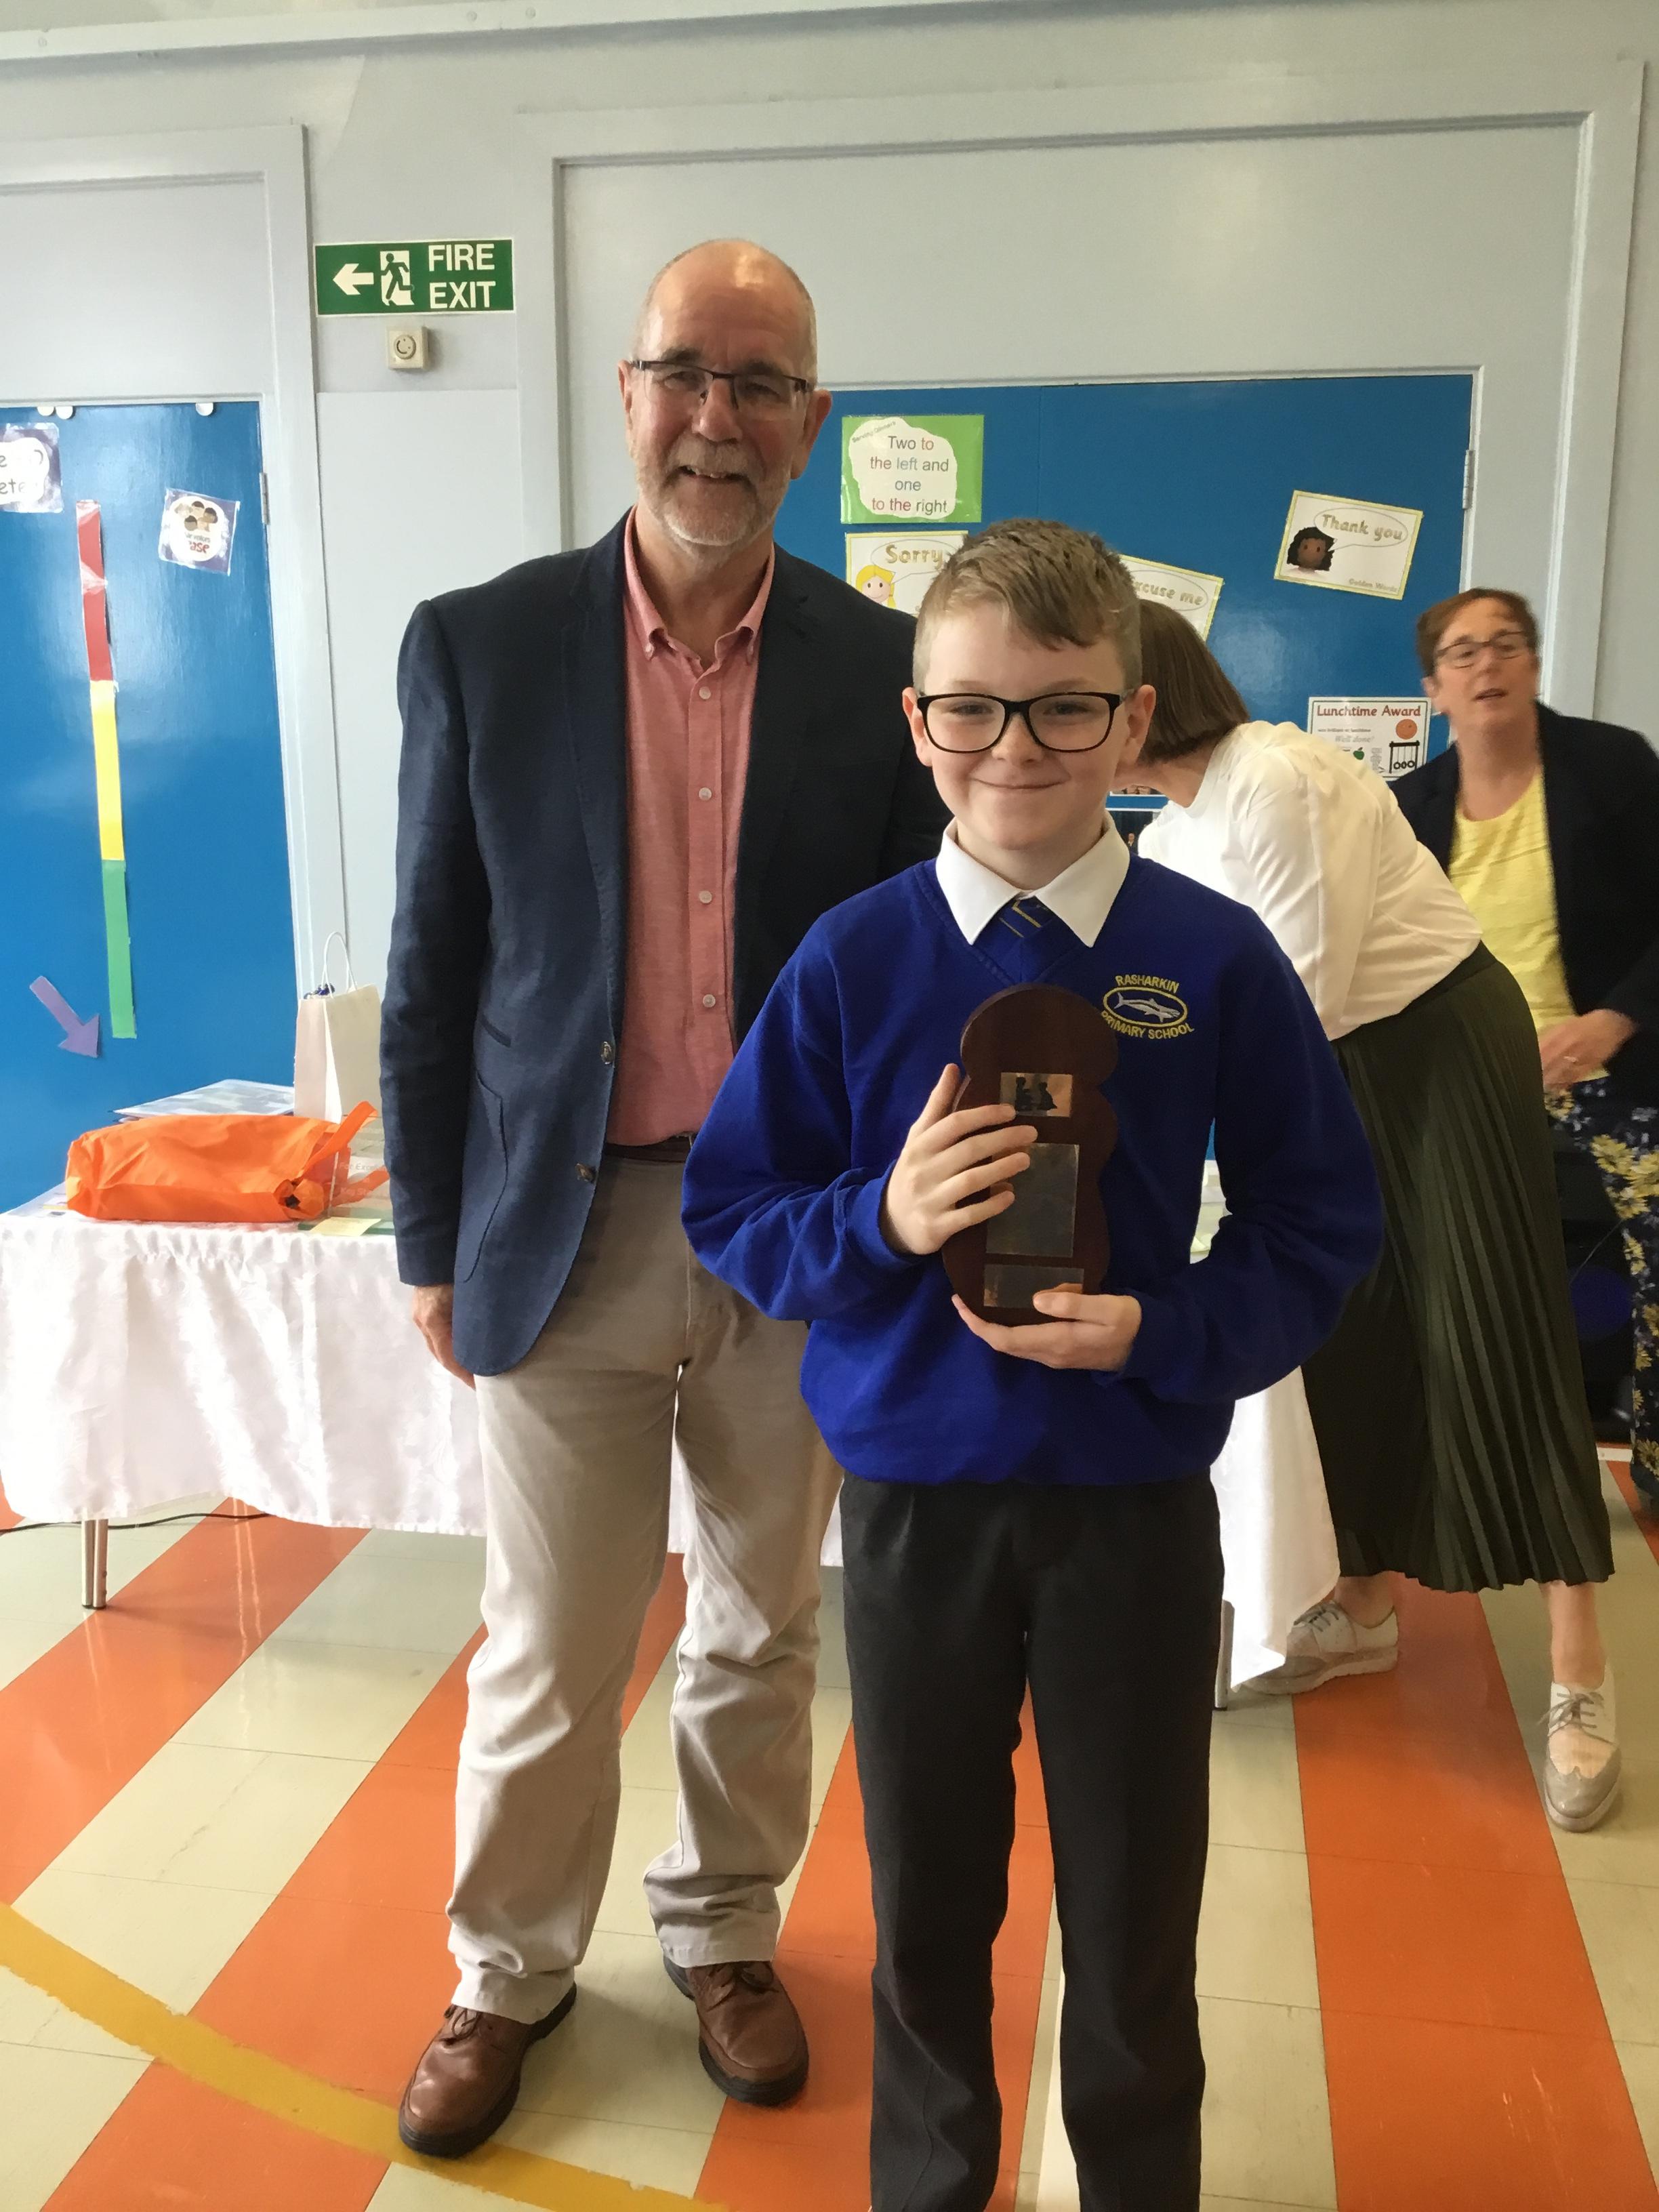 Harley, Mr Lee's Caring Award